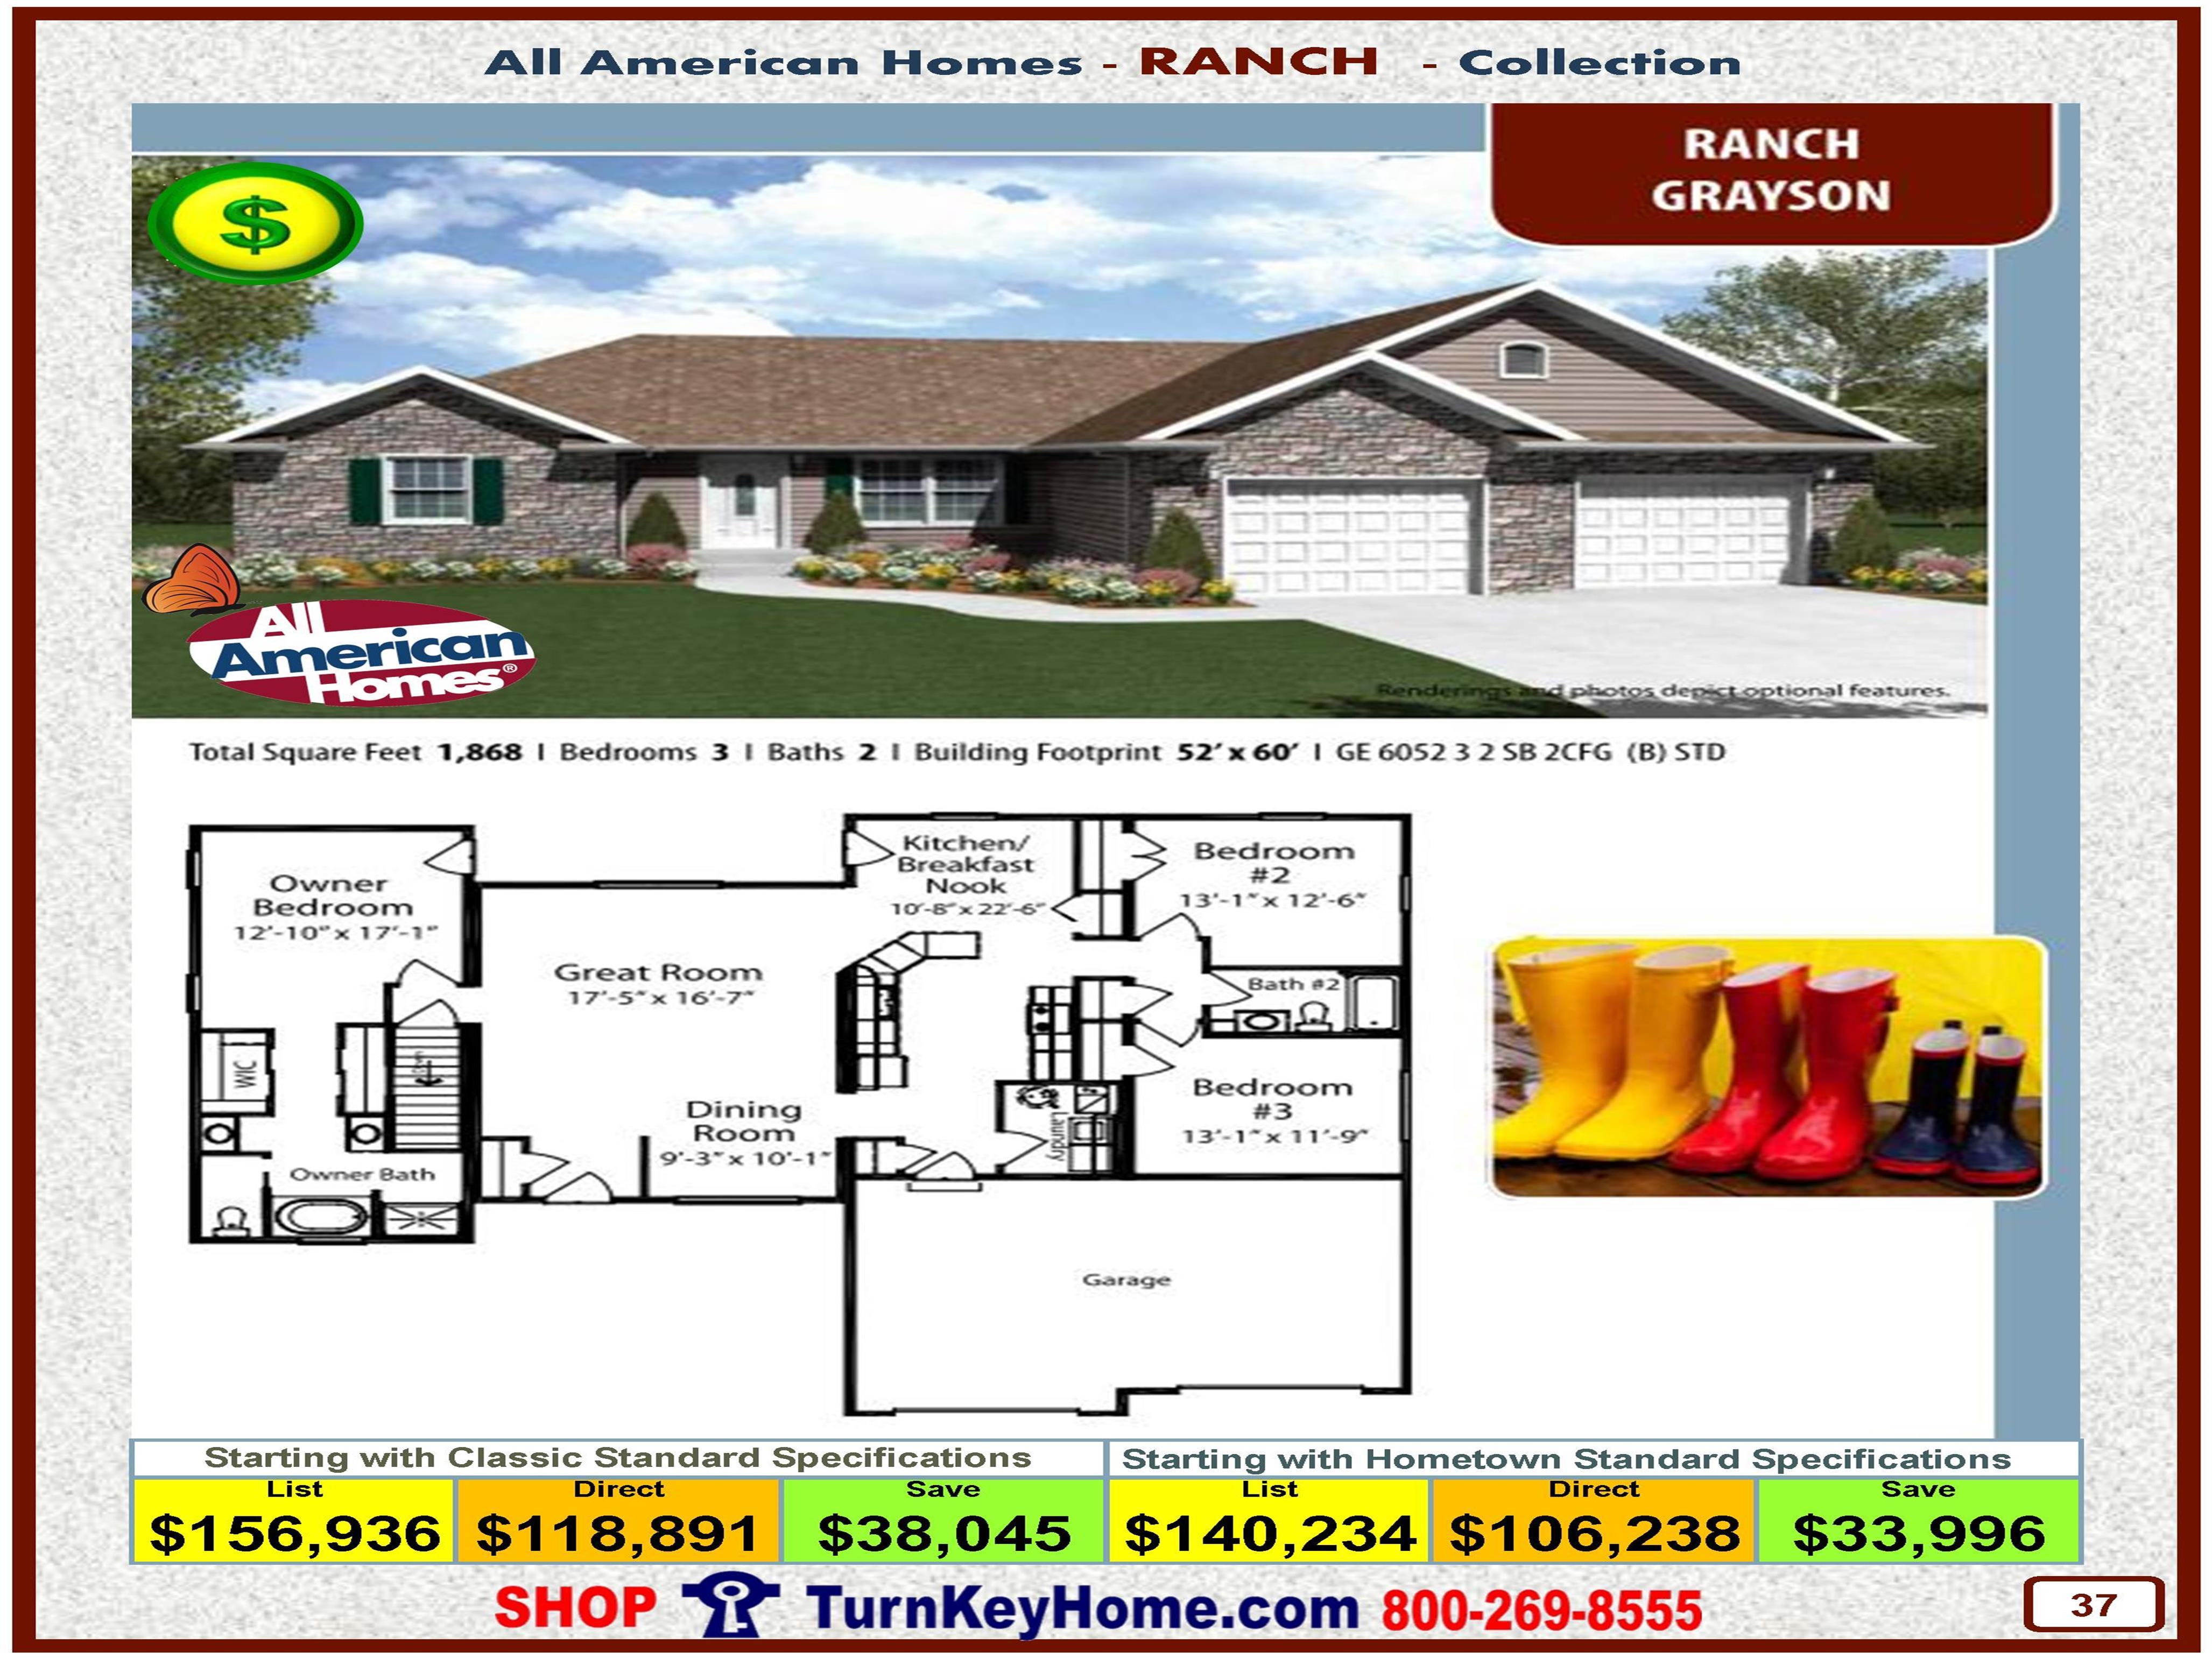 grayson all american modular home ranch collection plan price